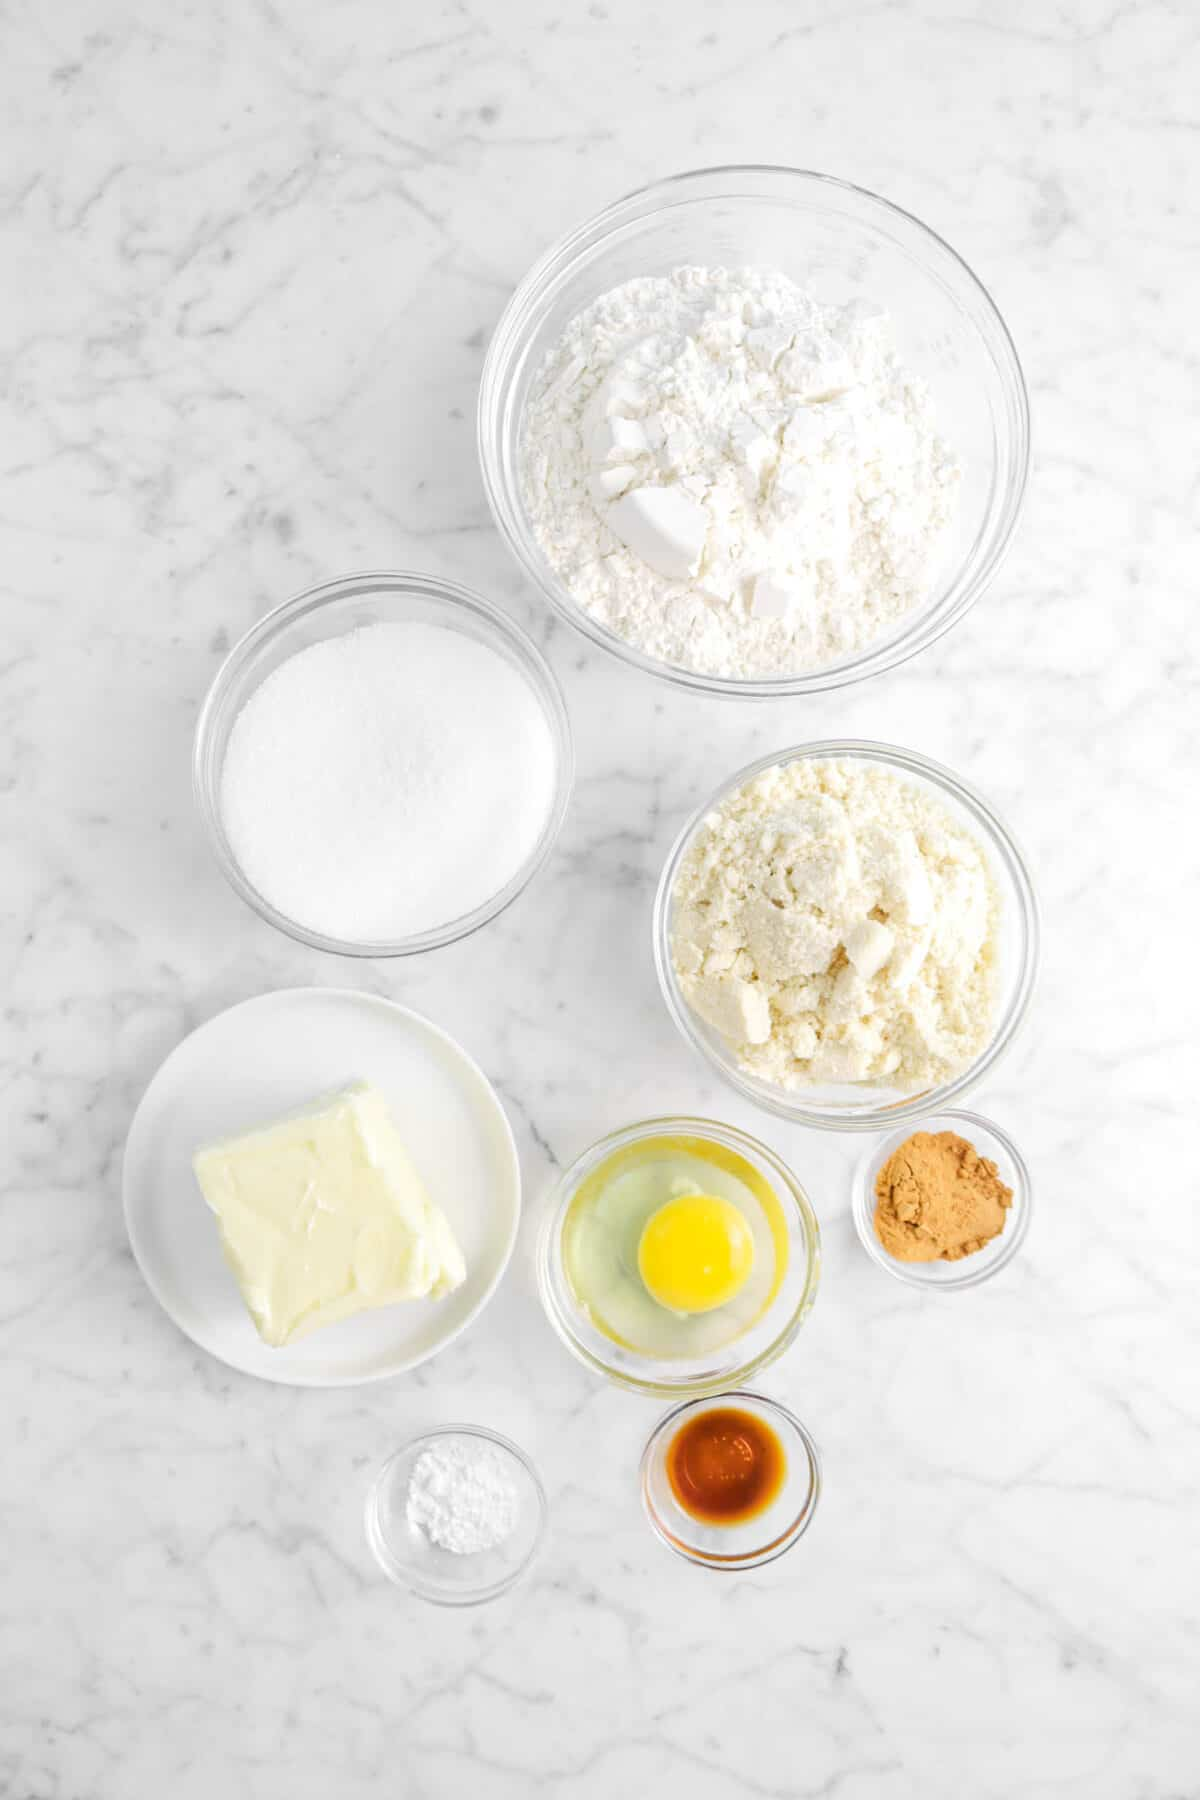 flour, sugar, almond flour, cinnamon, egg, butter, vanilla, and baking powder